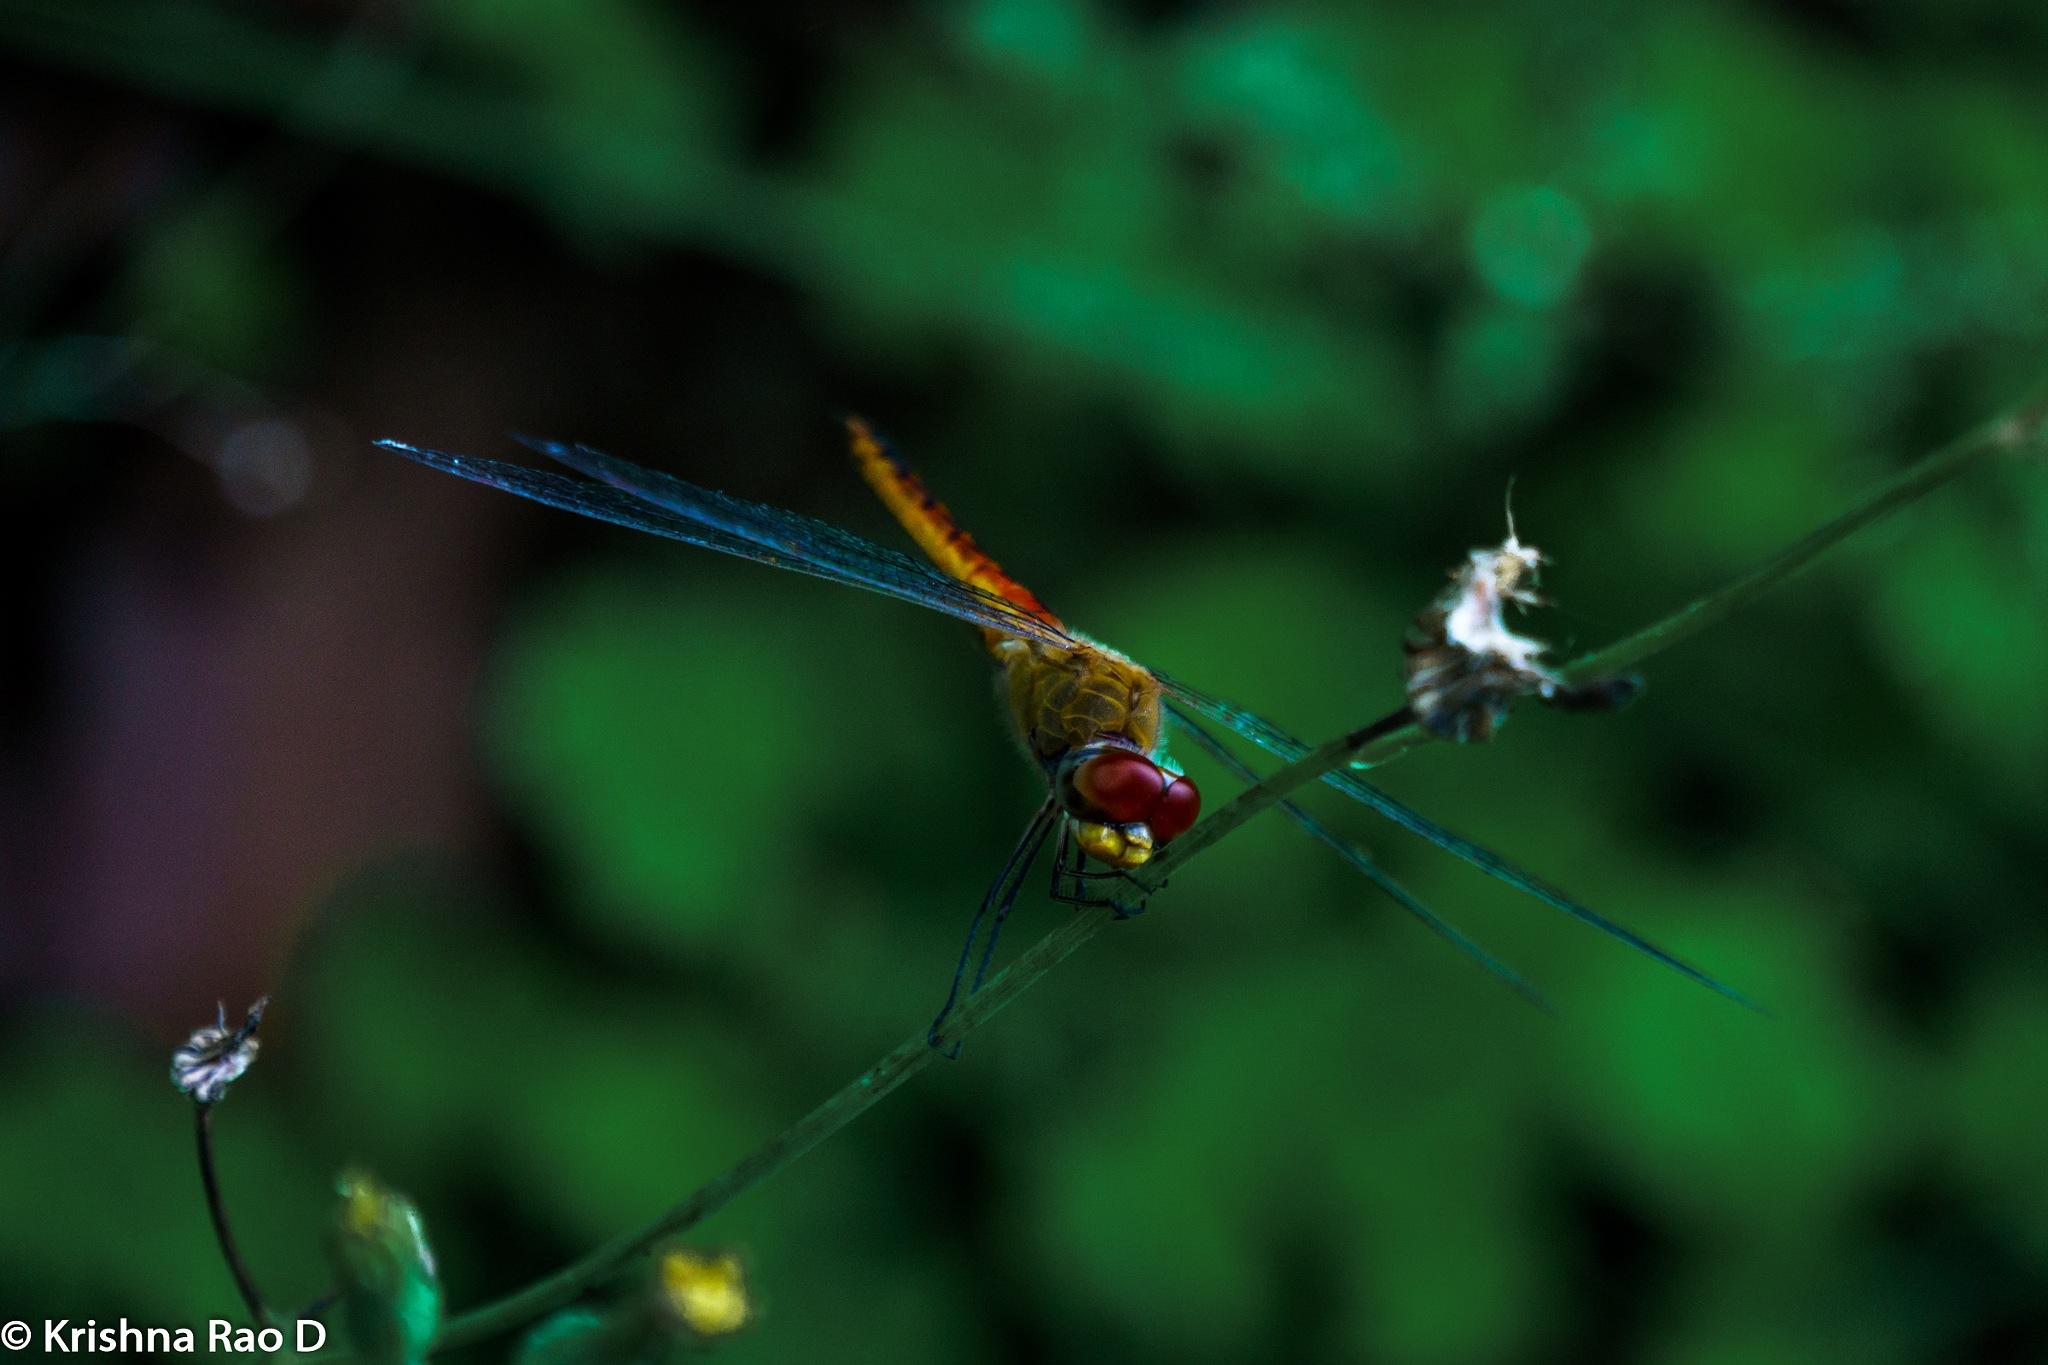 dragonfly by Krishna Rao D